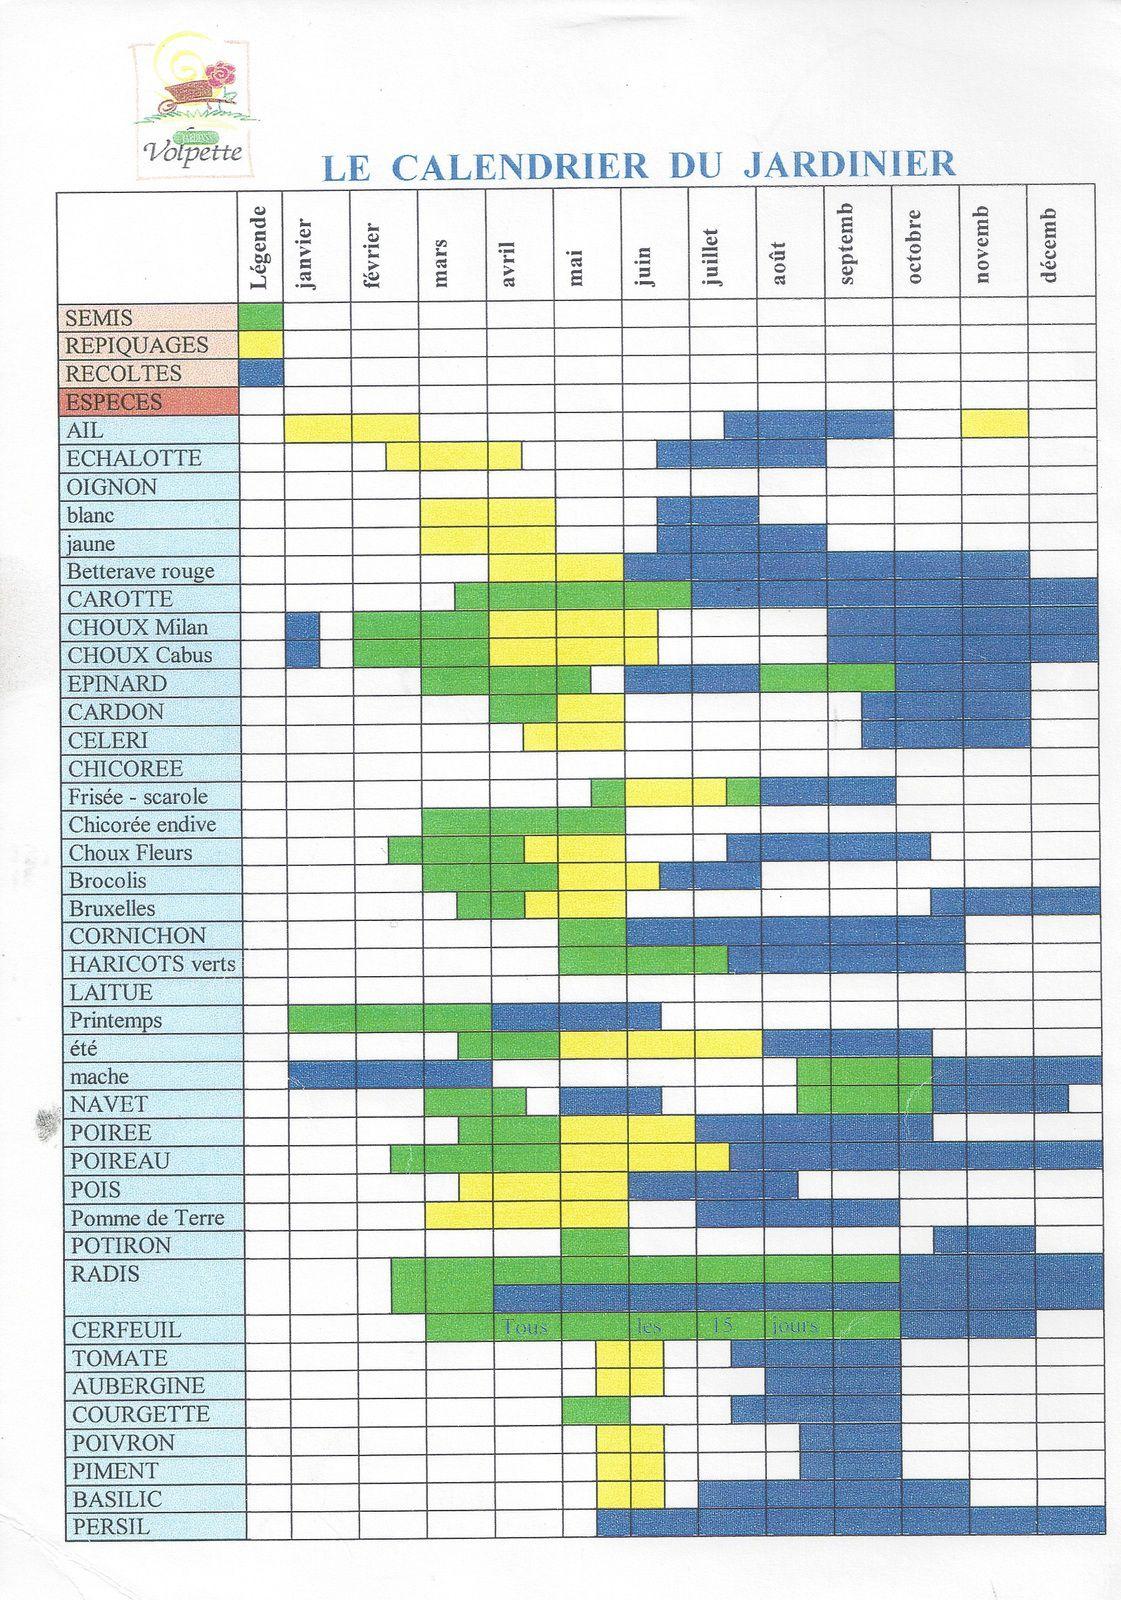 calendrier du potager jardins volpette